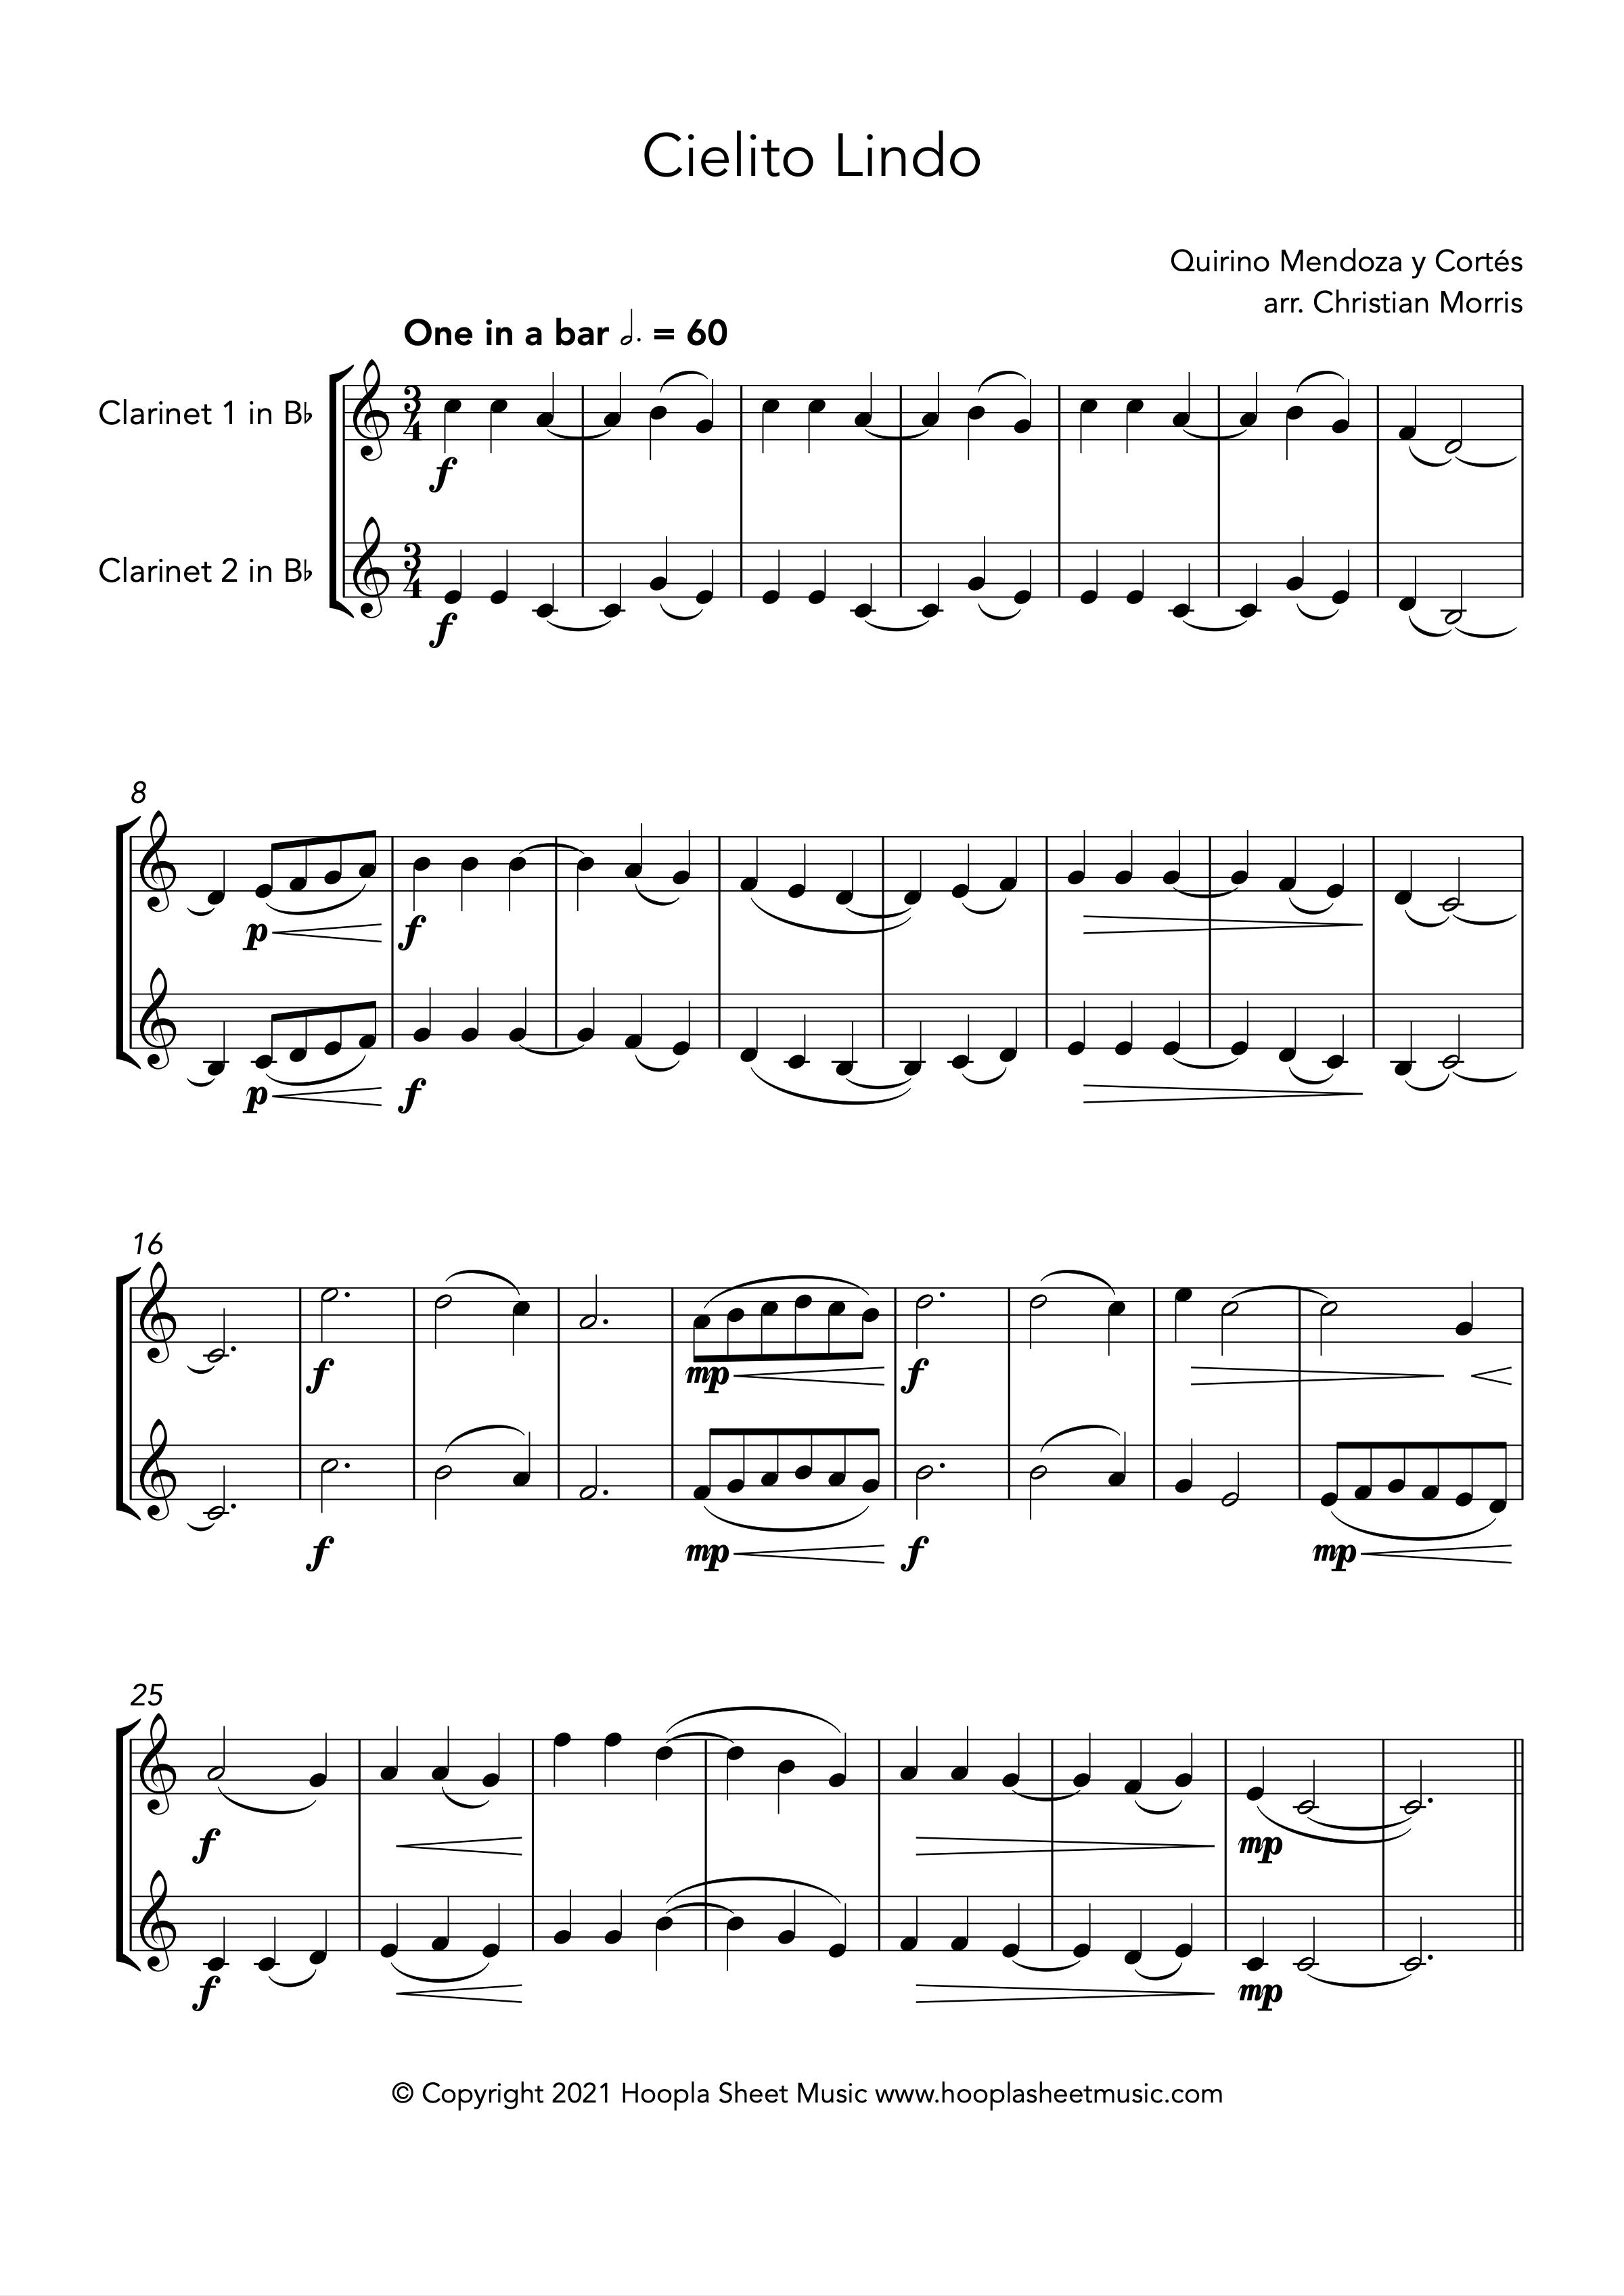 Cielito Lindo (Clarinet Duet)